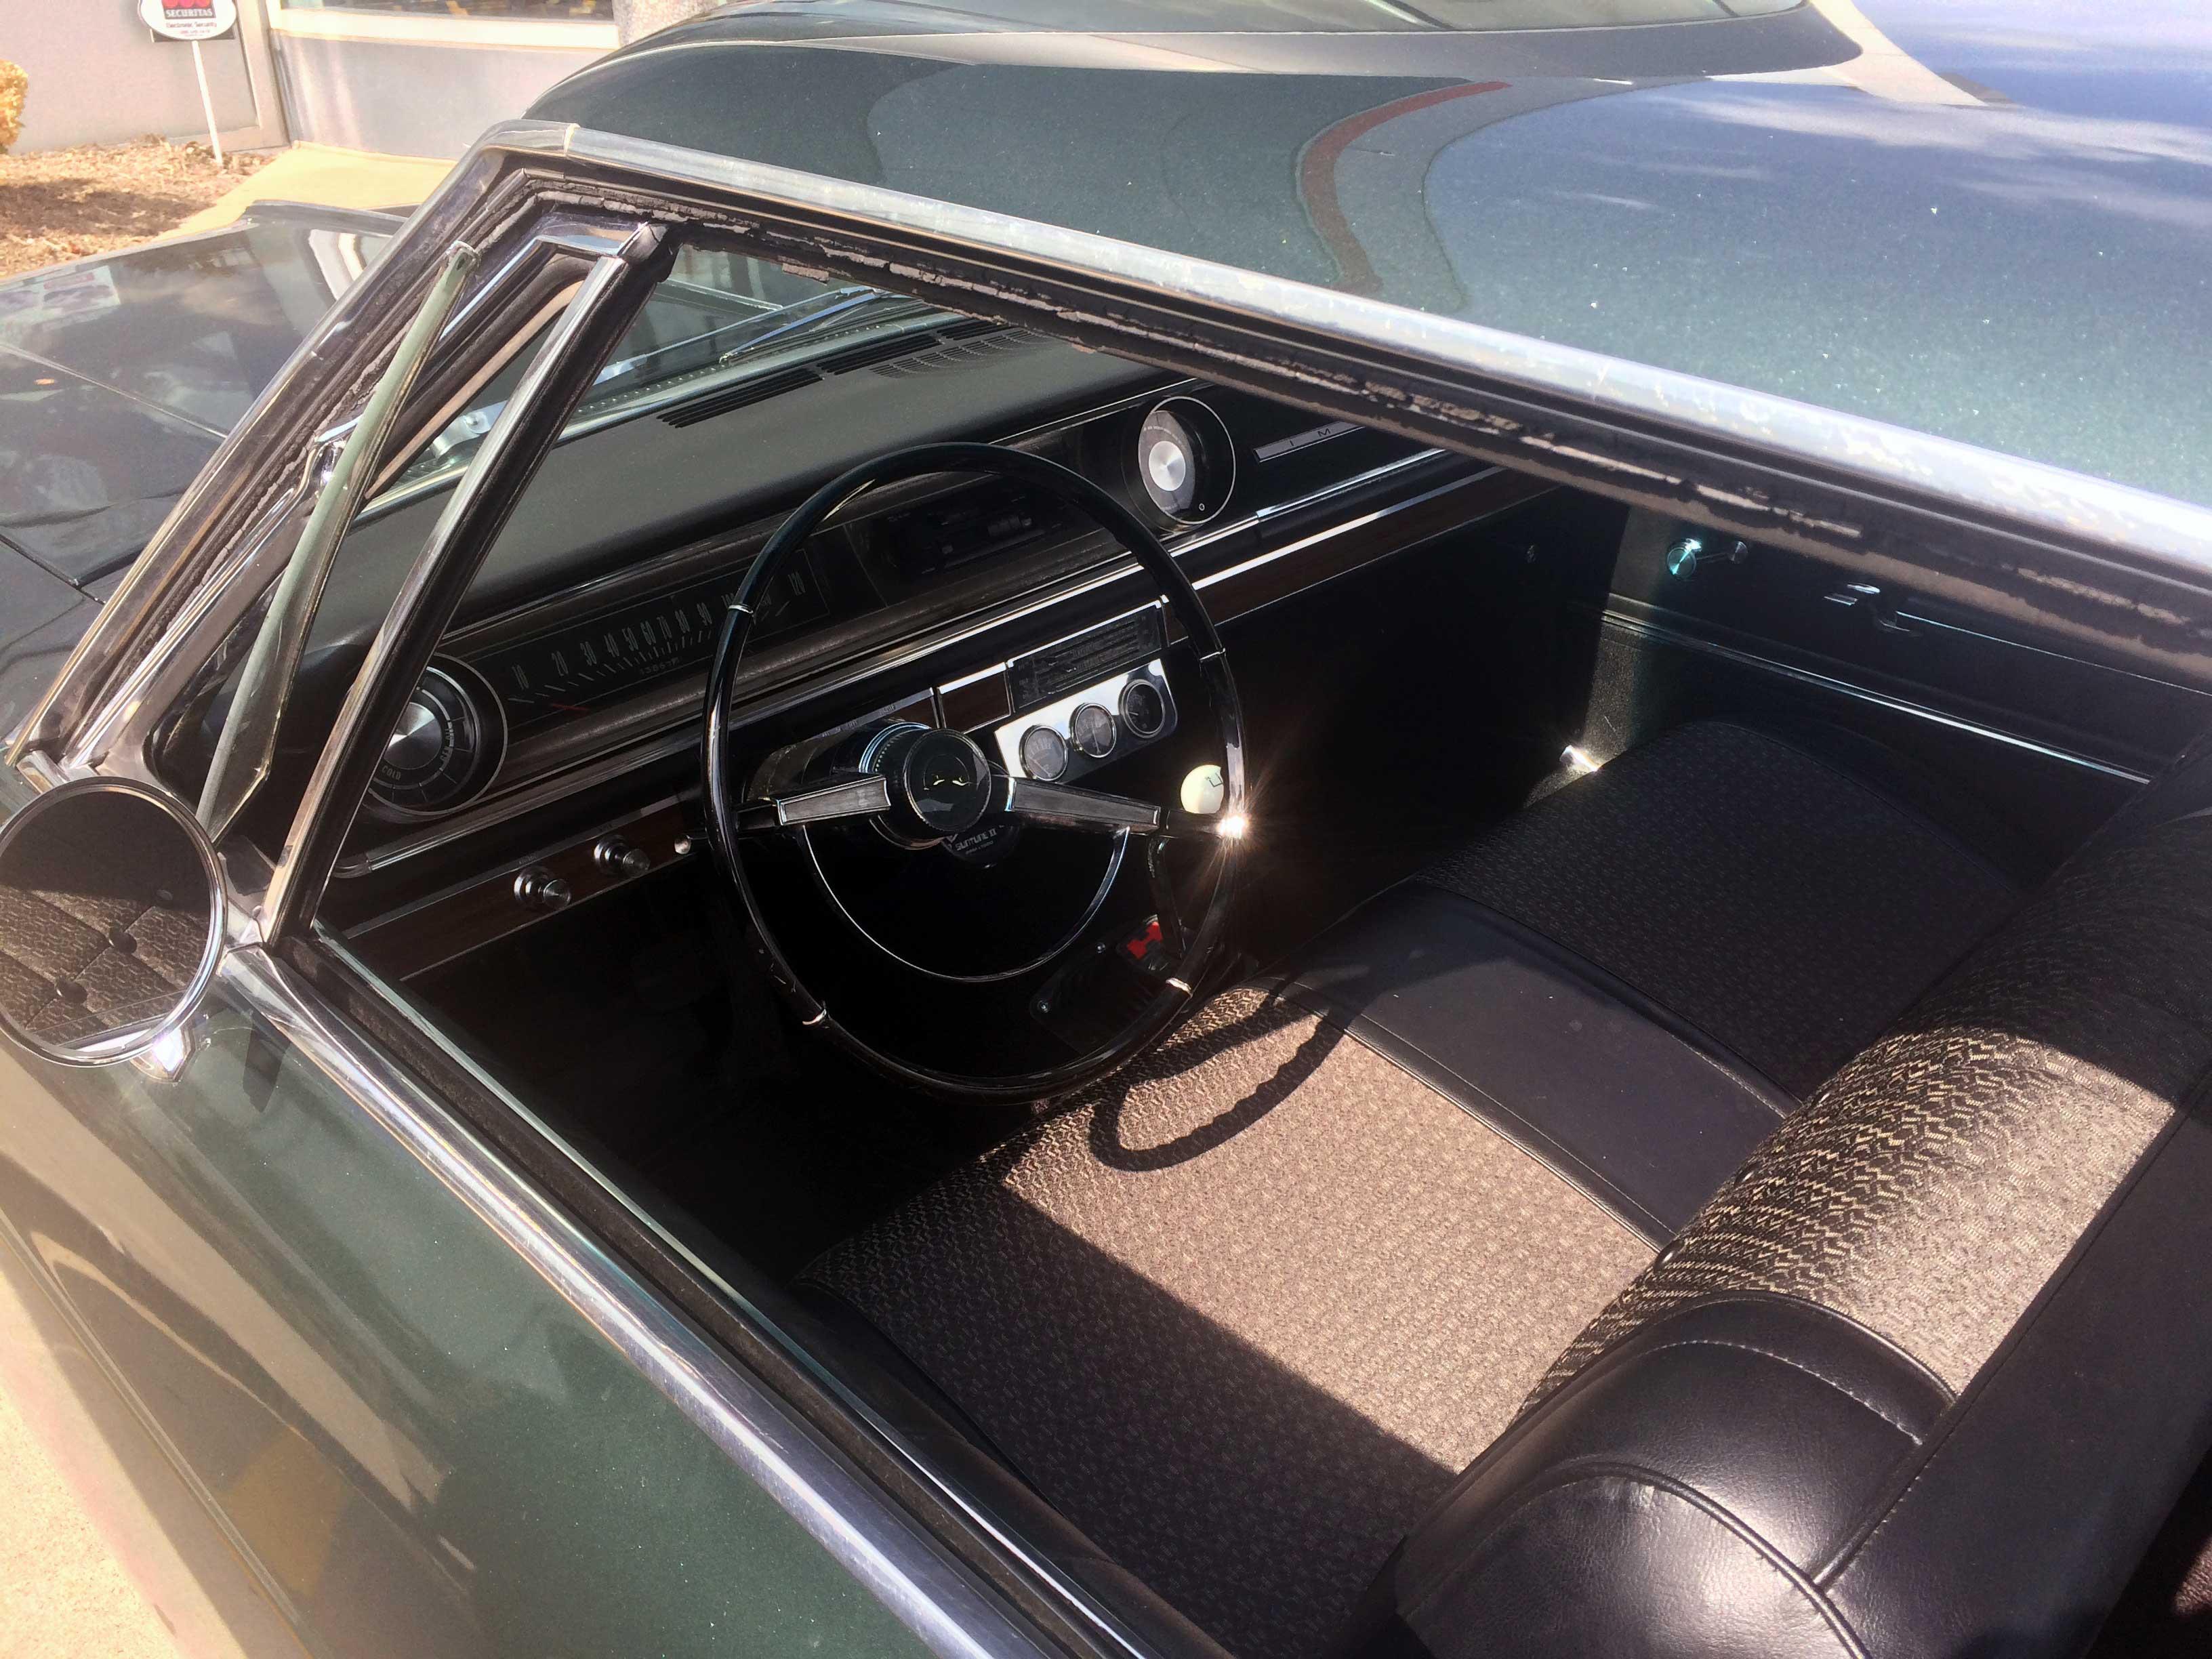 chevy impala interior 2018 impala full size car full size sedan chevrolet unique 2007 chevy. Black Bedroom Furniture Sets. Home Design Ideas